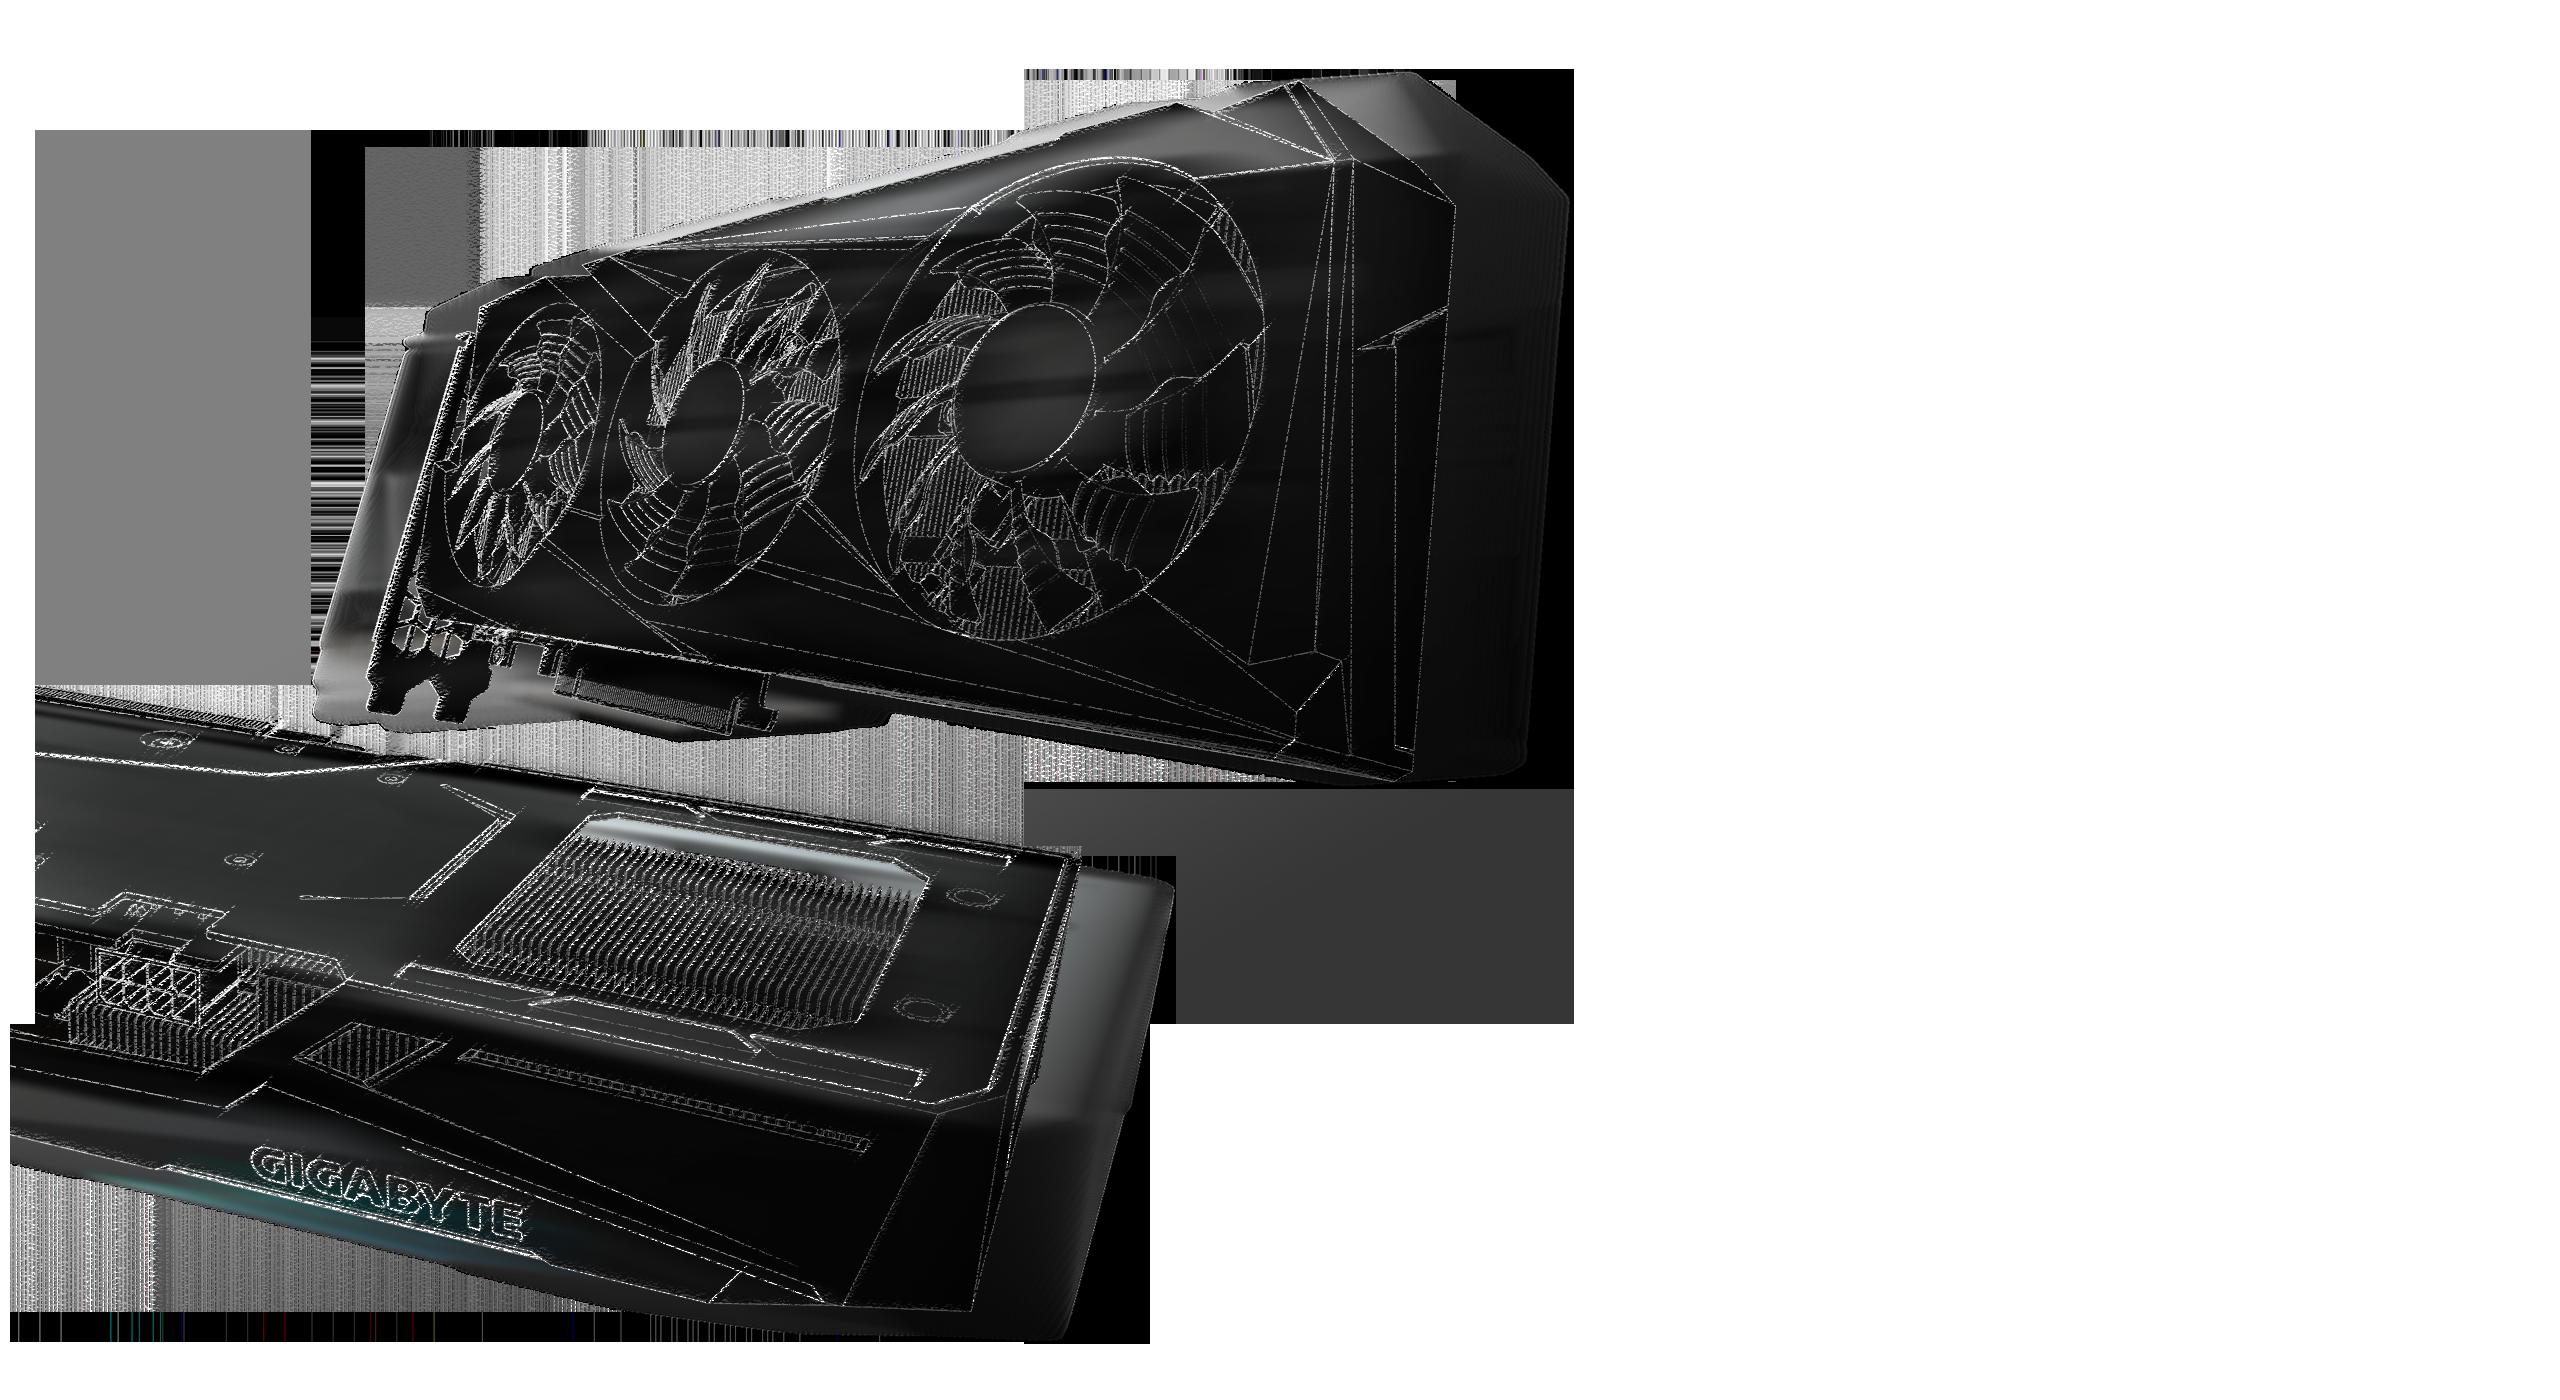 Gigabyte GeForce RTX 3060 GAMING OC 12G - GV-N3060GAMING OC-12GD 19